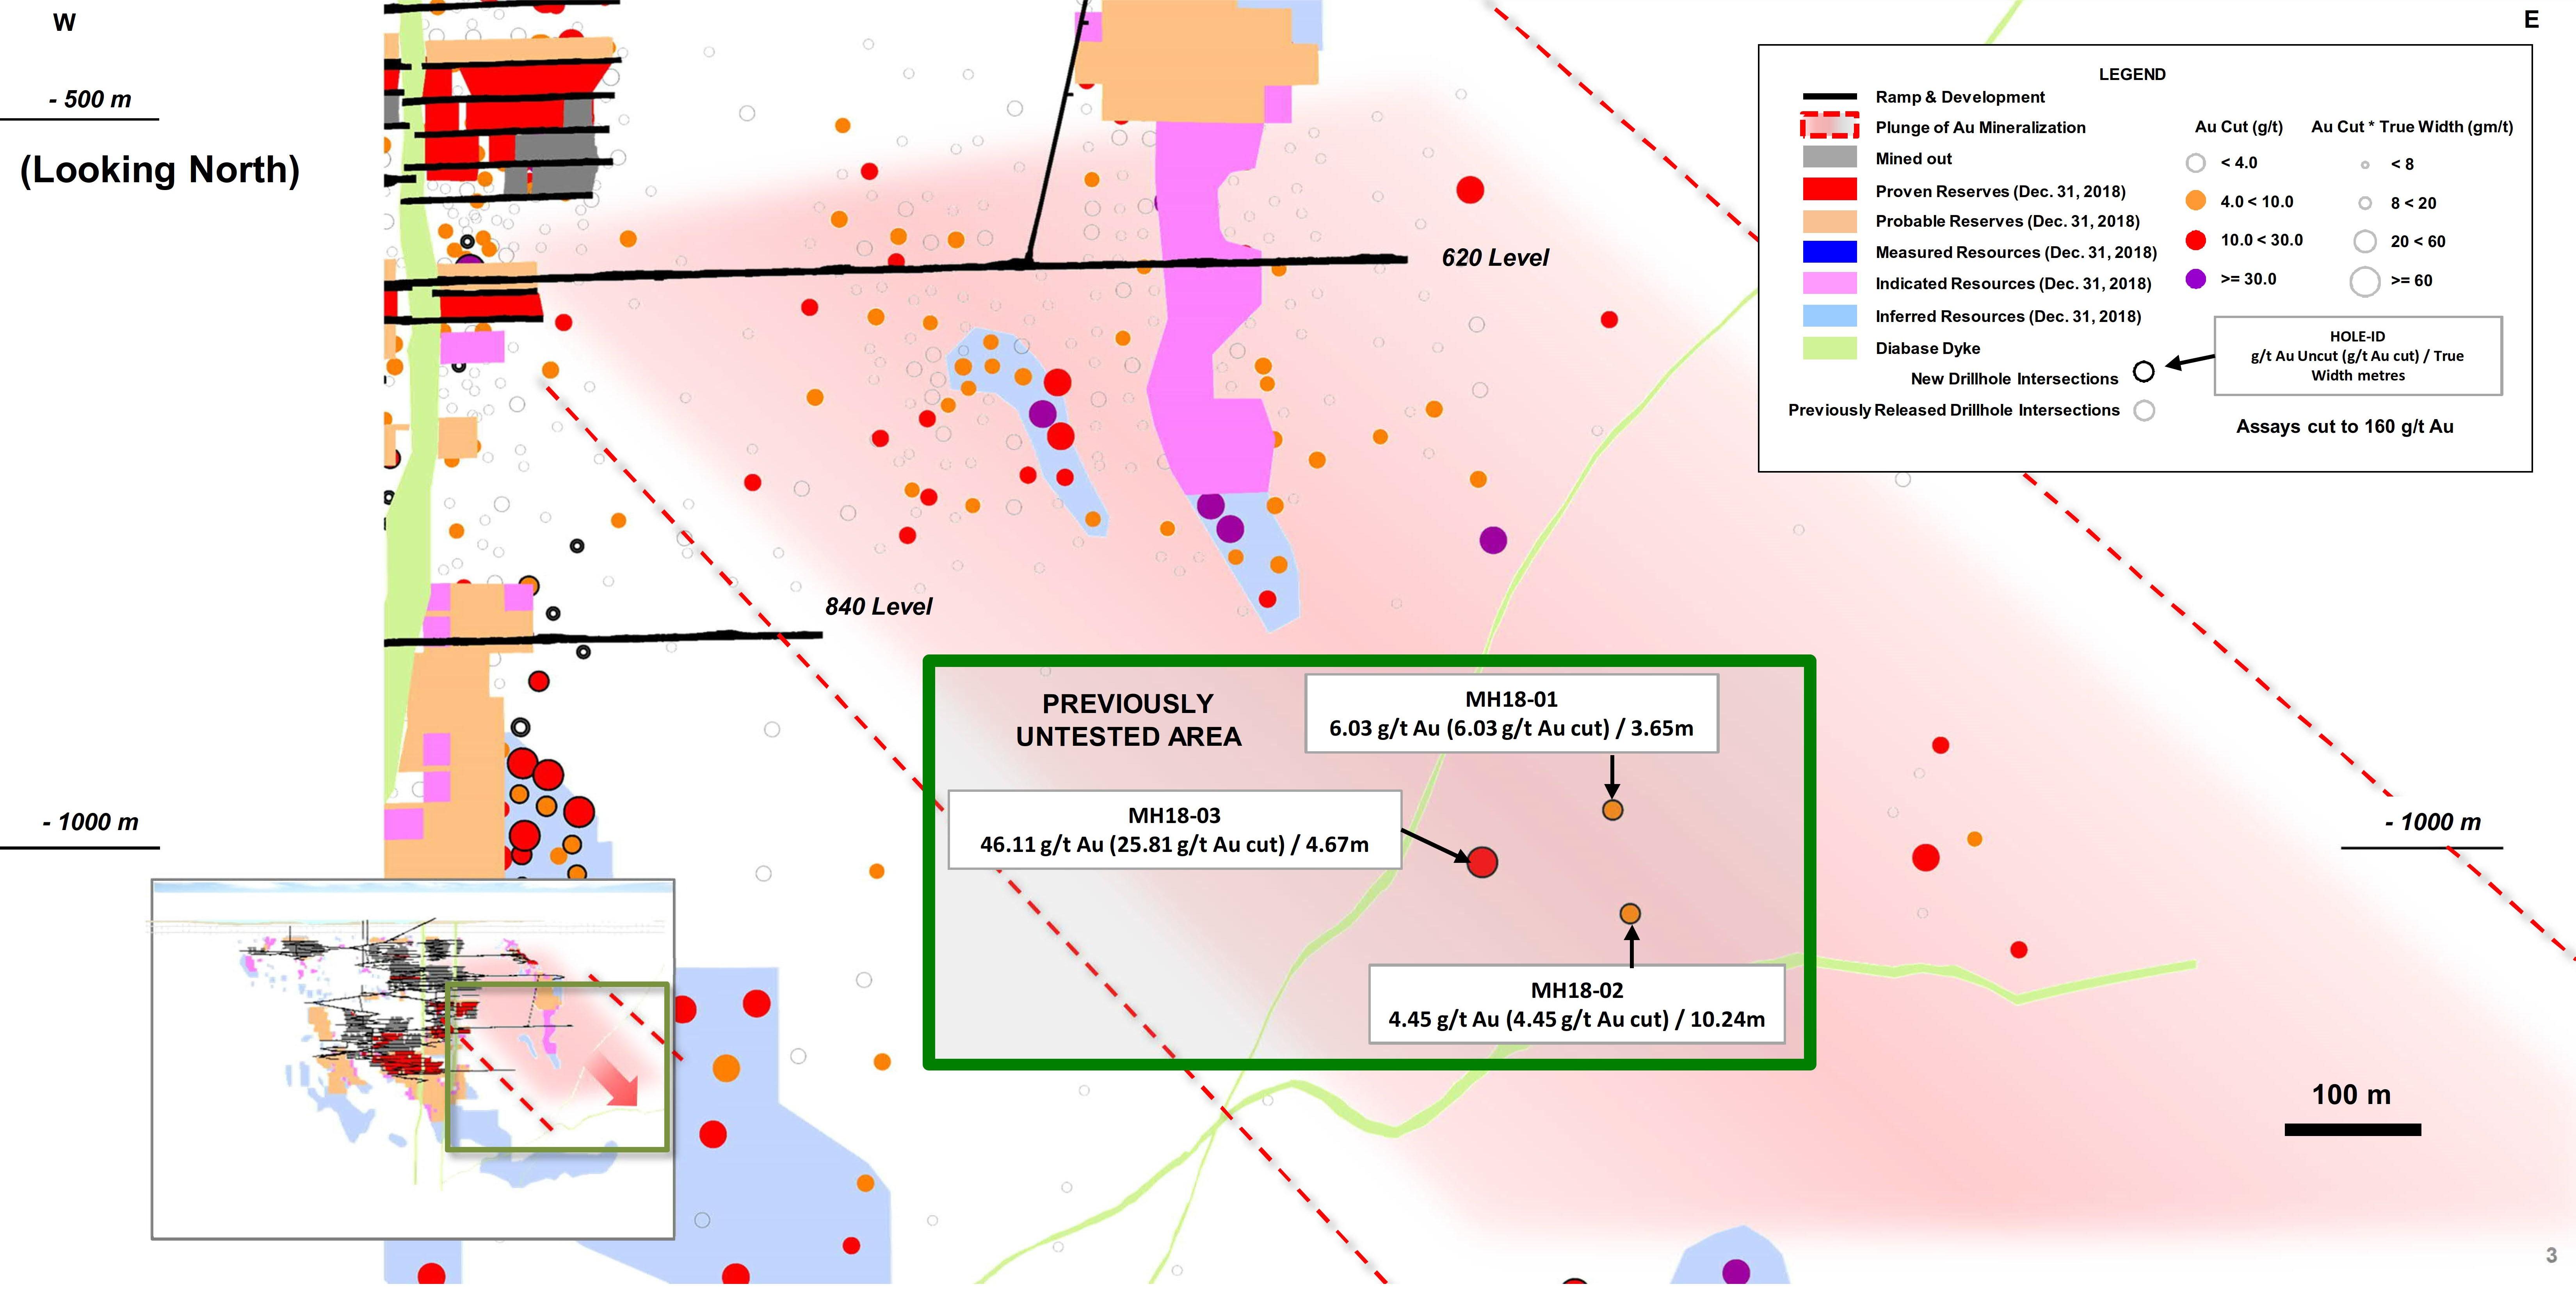 Figure 3: Island Gold Mine Longitudinal - Eastern Extension